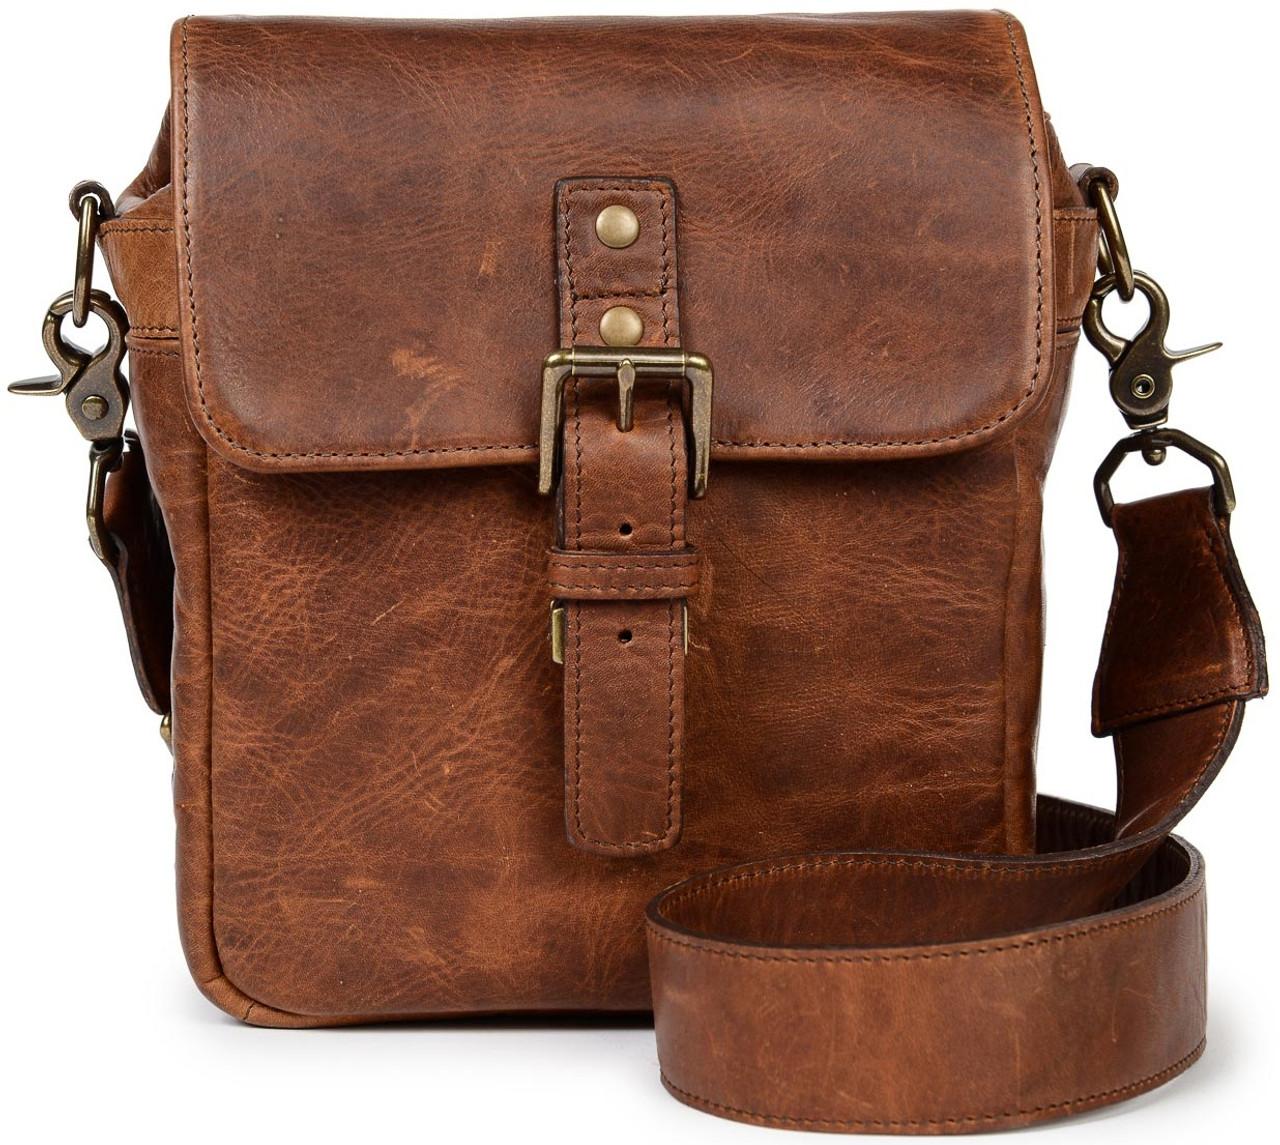 ONA The Leather Bond Street Bag